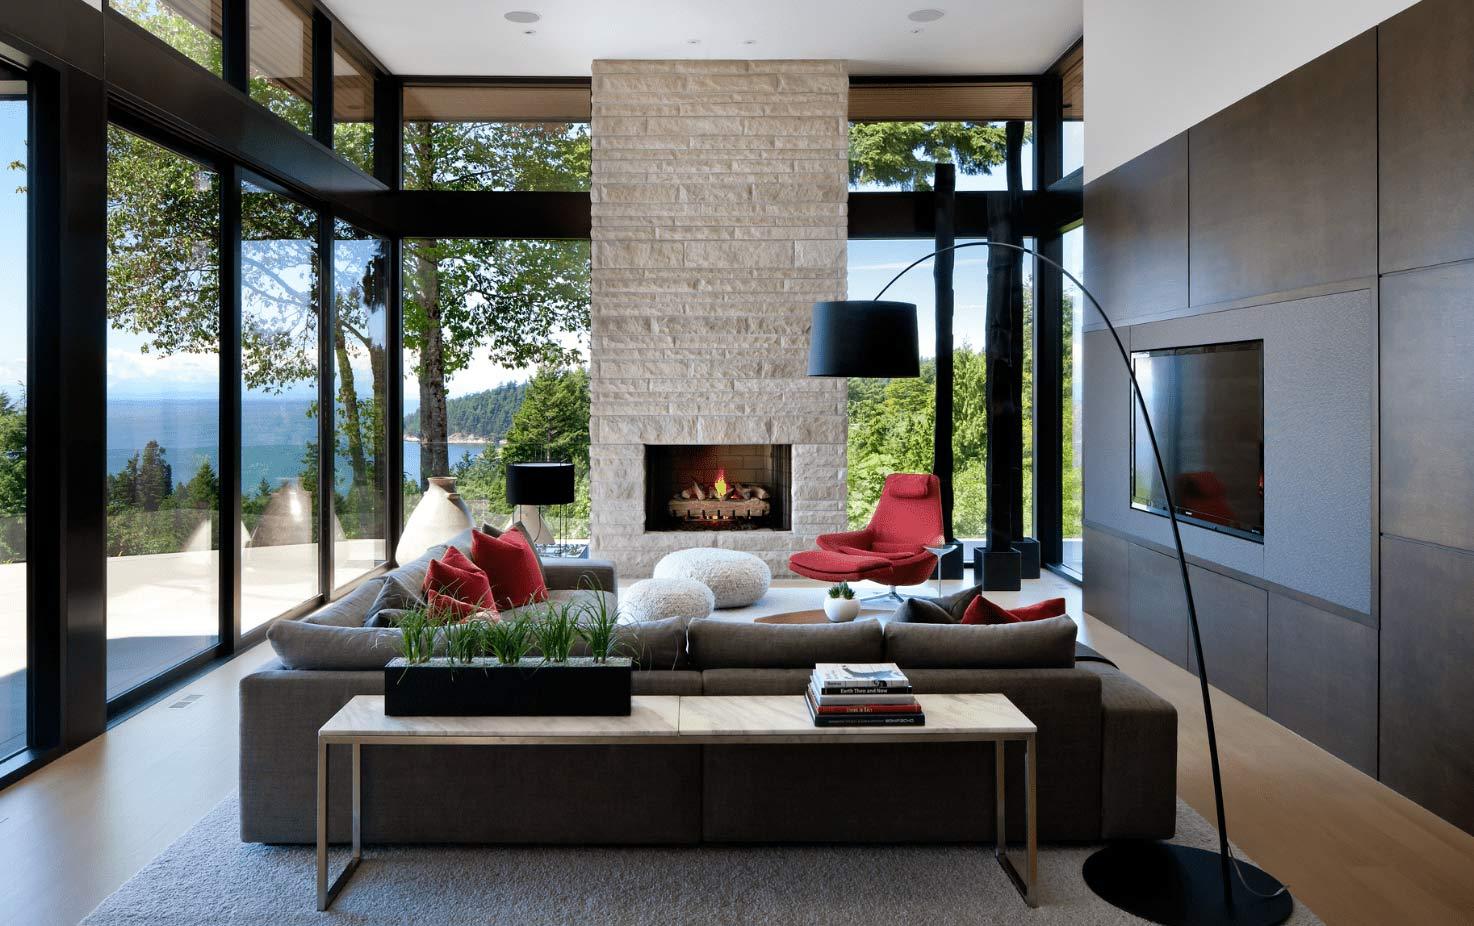 living room مدرن ترین طراحی دکوراسیون داخلی در سال 2021